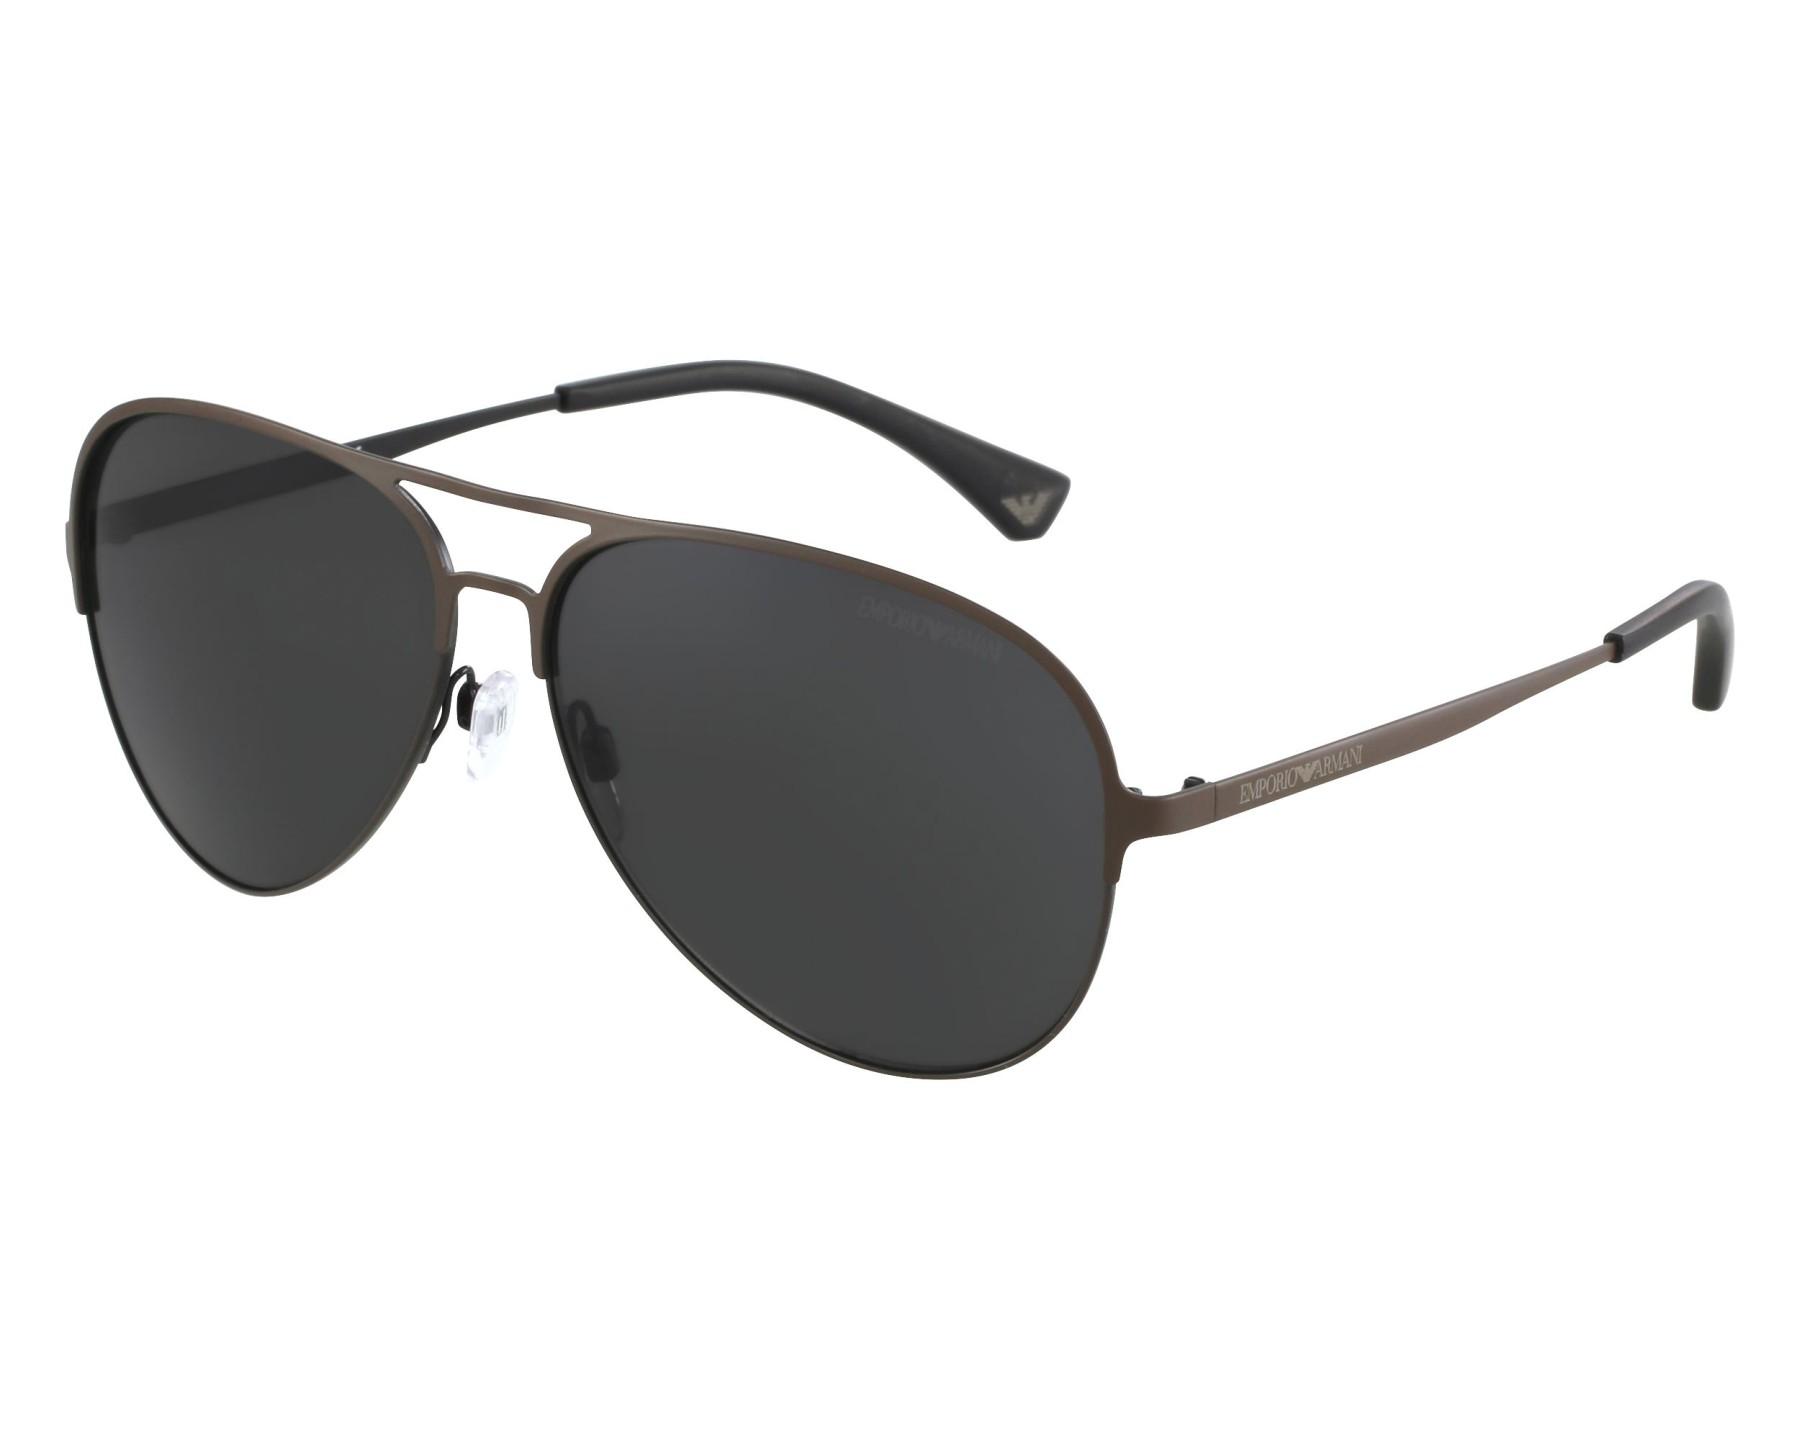 4832361441 thumbnail Sunglasses Emporio Armani EA-2032 3128 87 - Brown front view